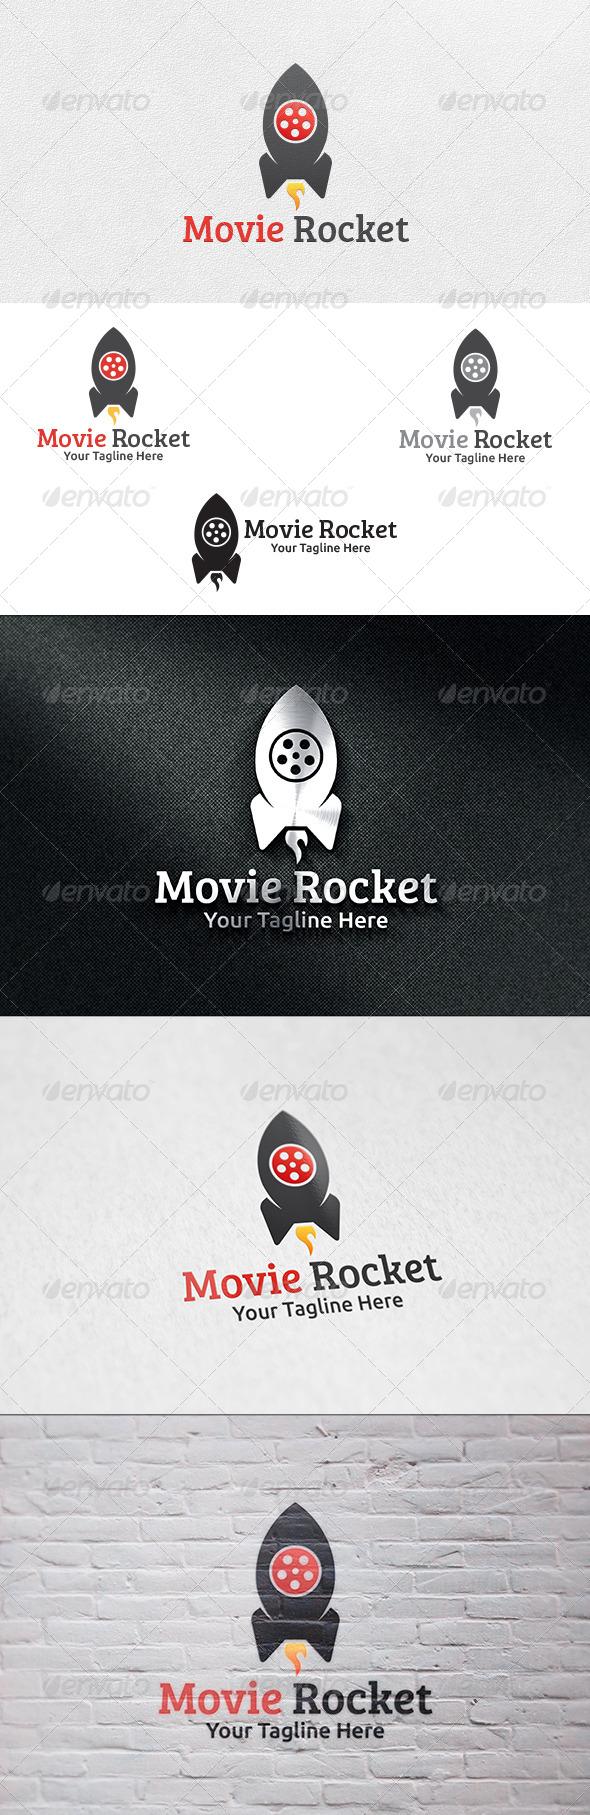 Movie Rocket - Logo Template - Symbols Logo Templates